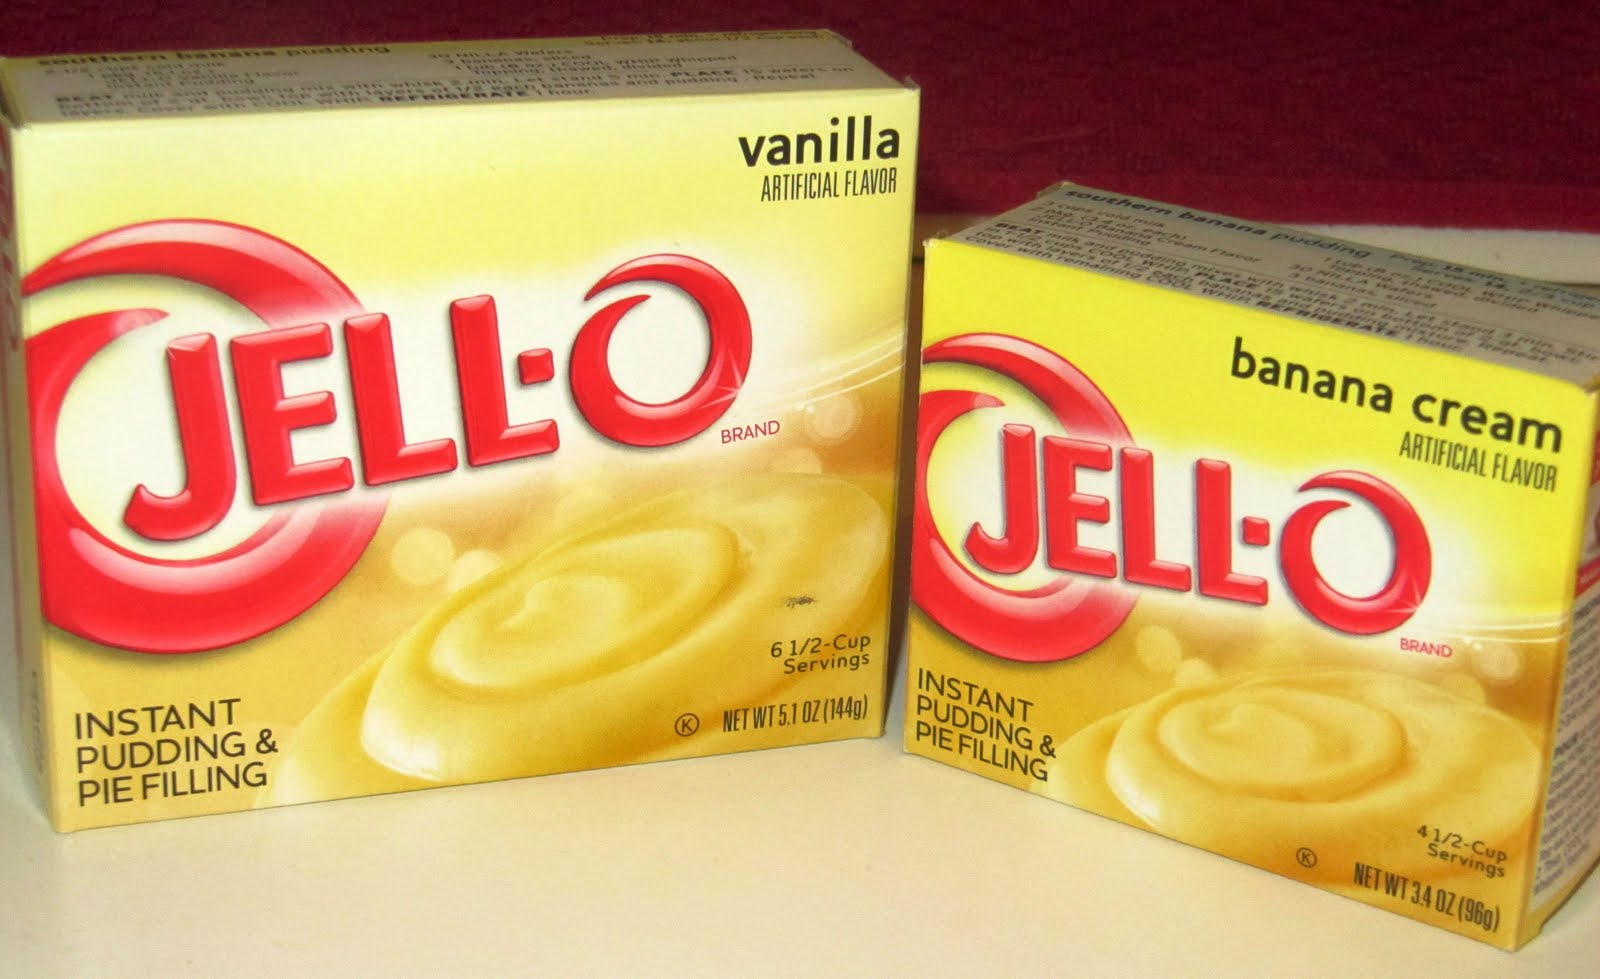 Jello Instant Pudding Cake Filling